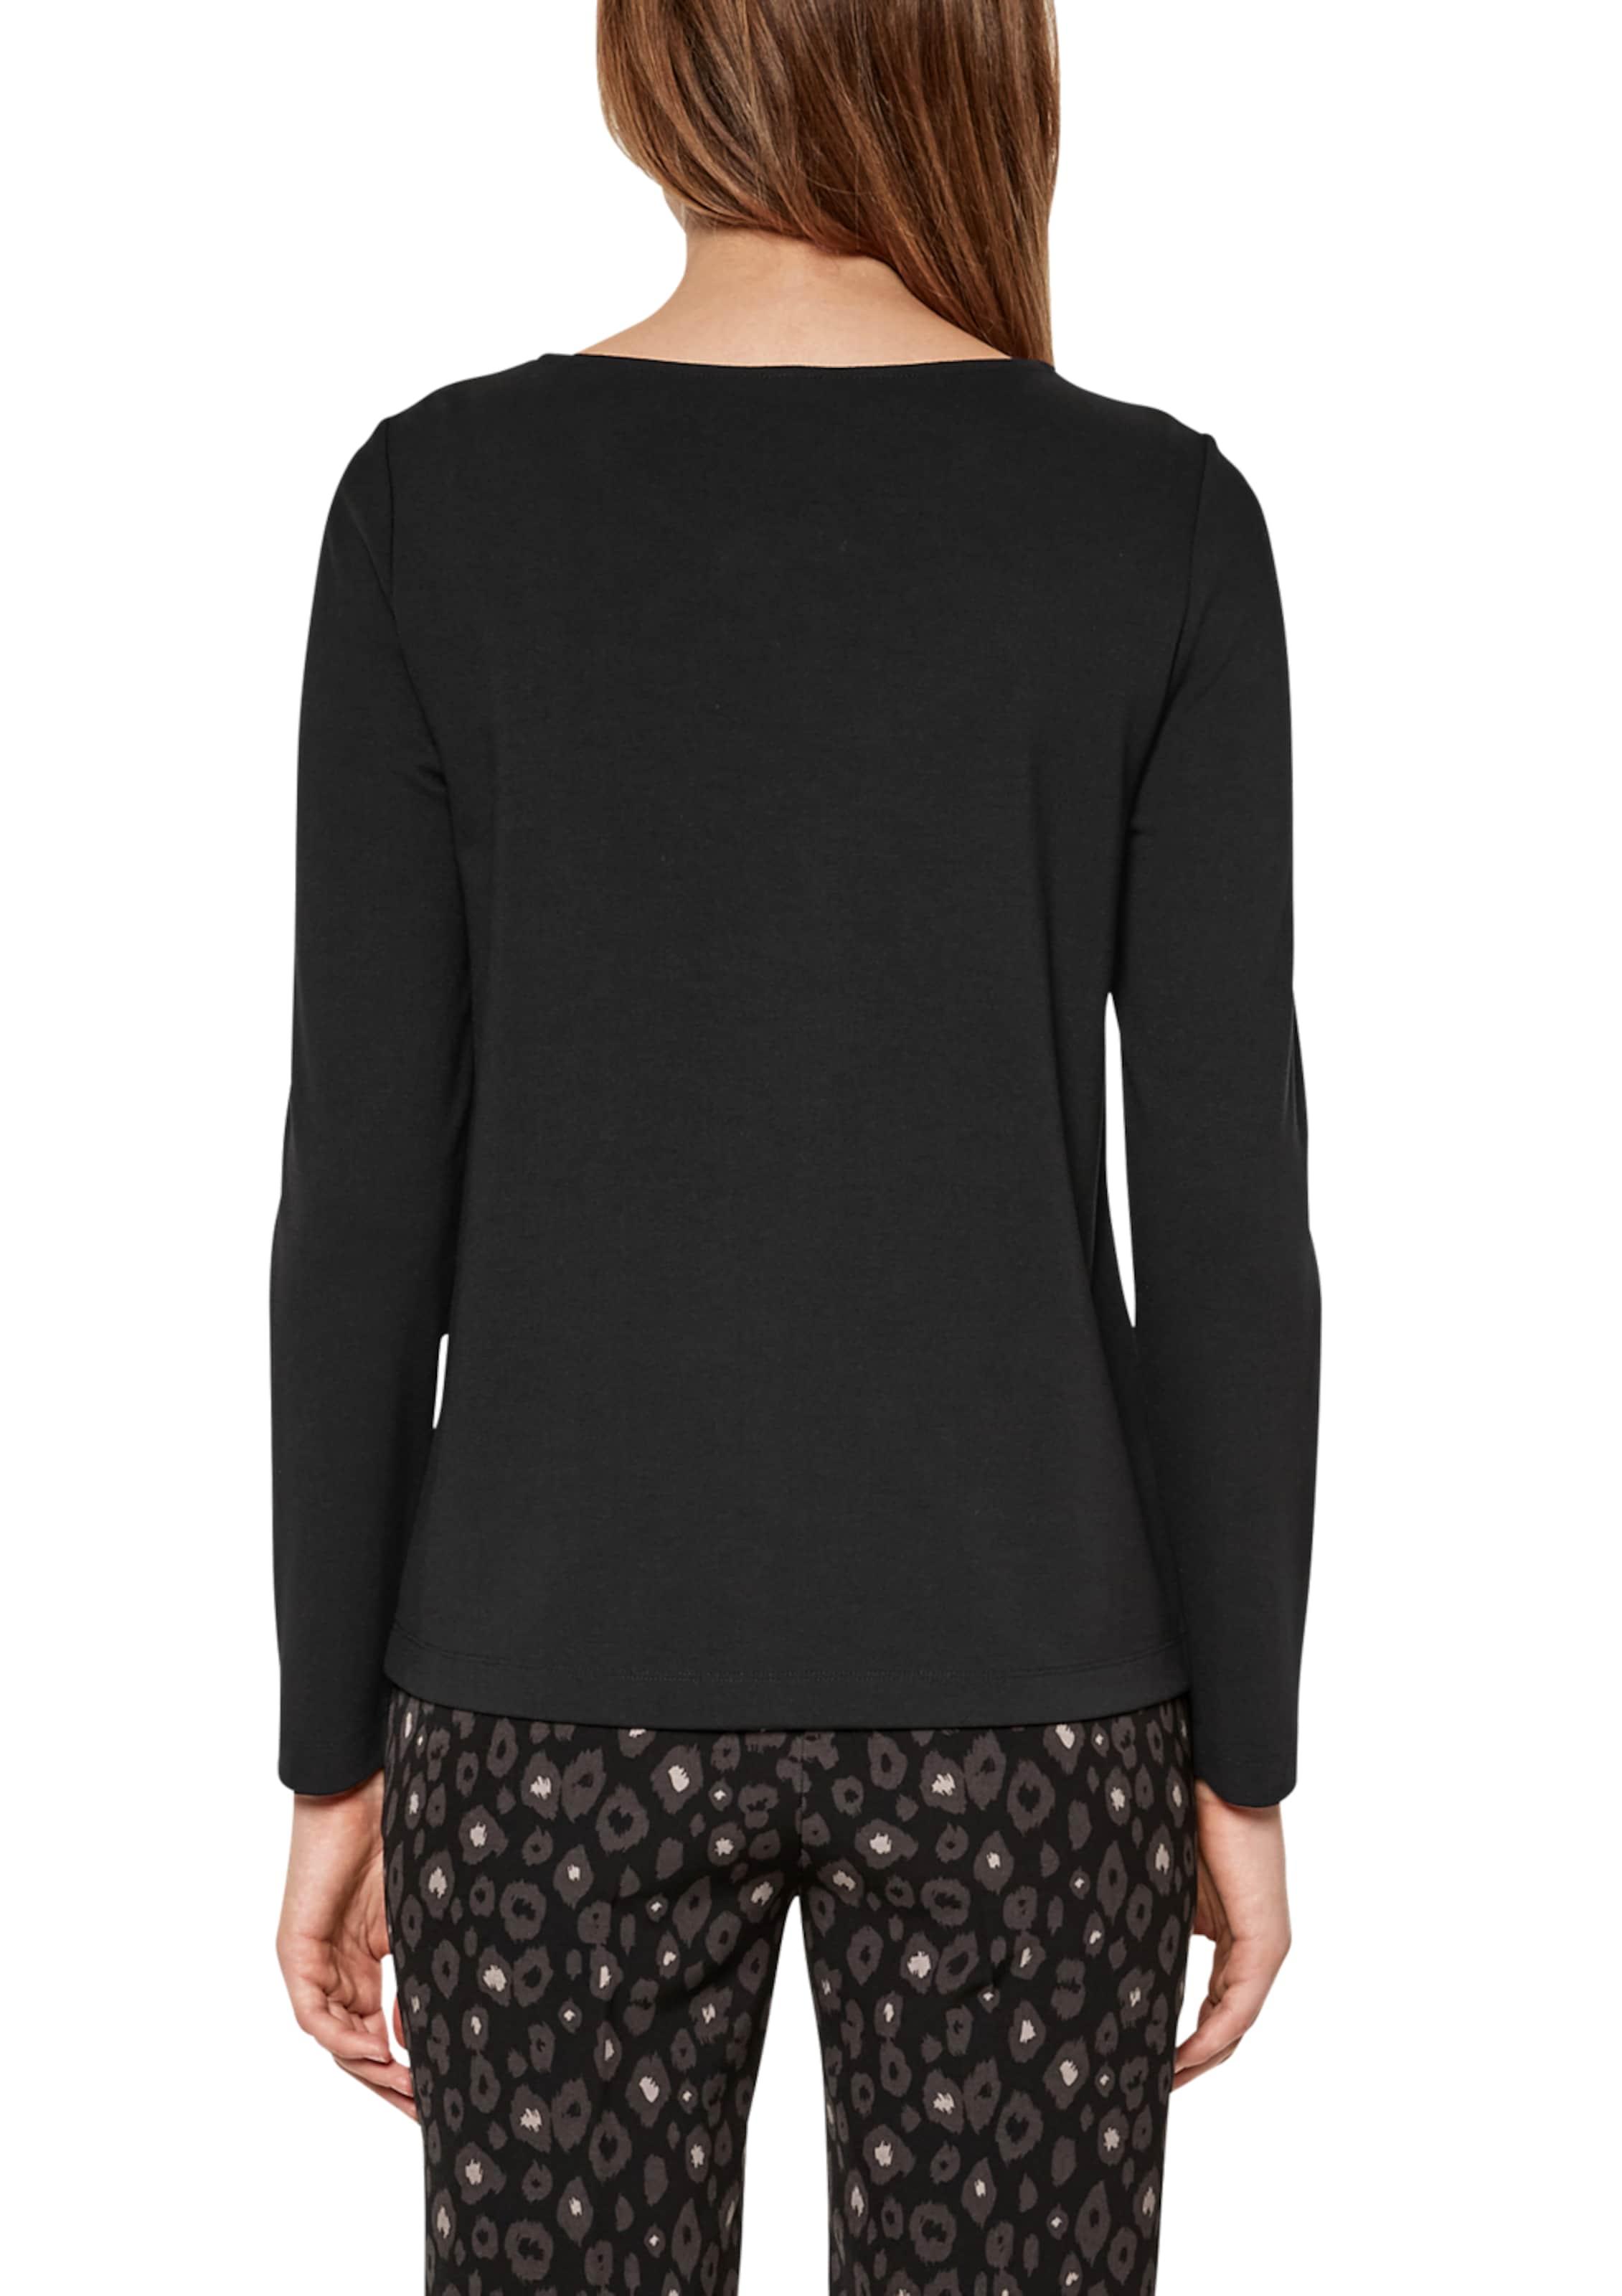 Schwarz S Black In Label Shirt oliver pVUzSM